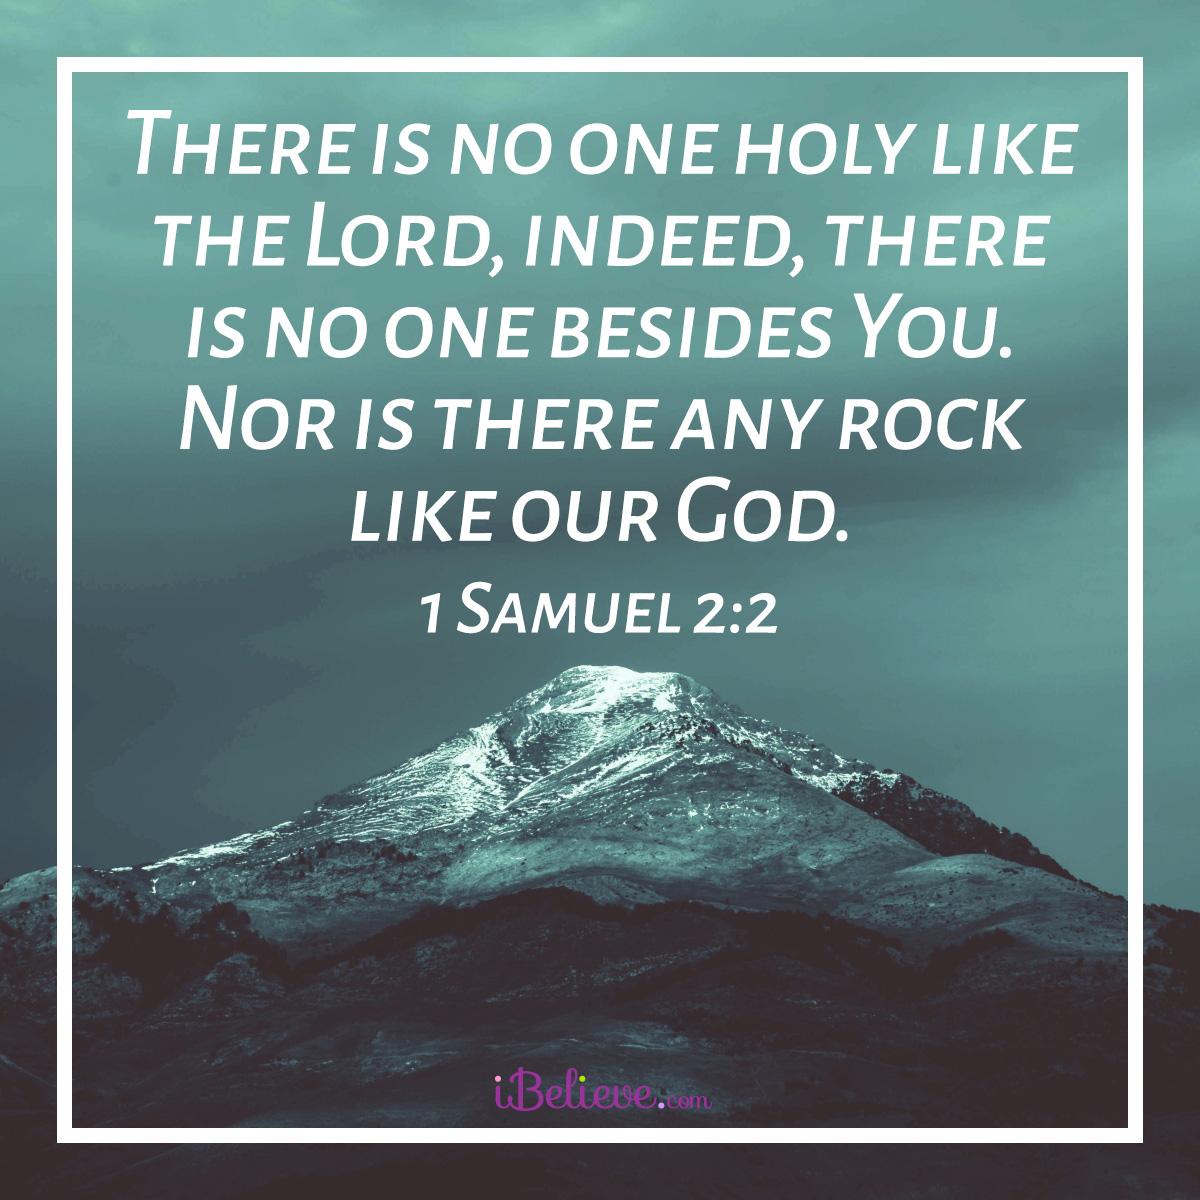 1 Samuel 2:2 sq